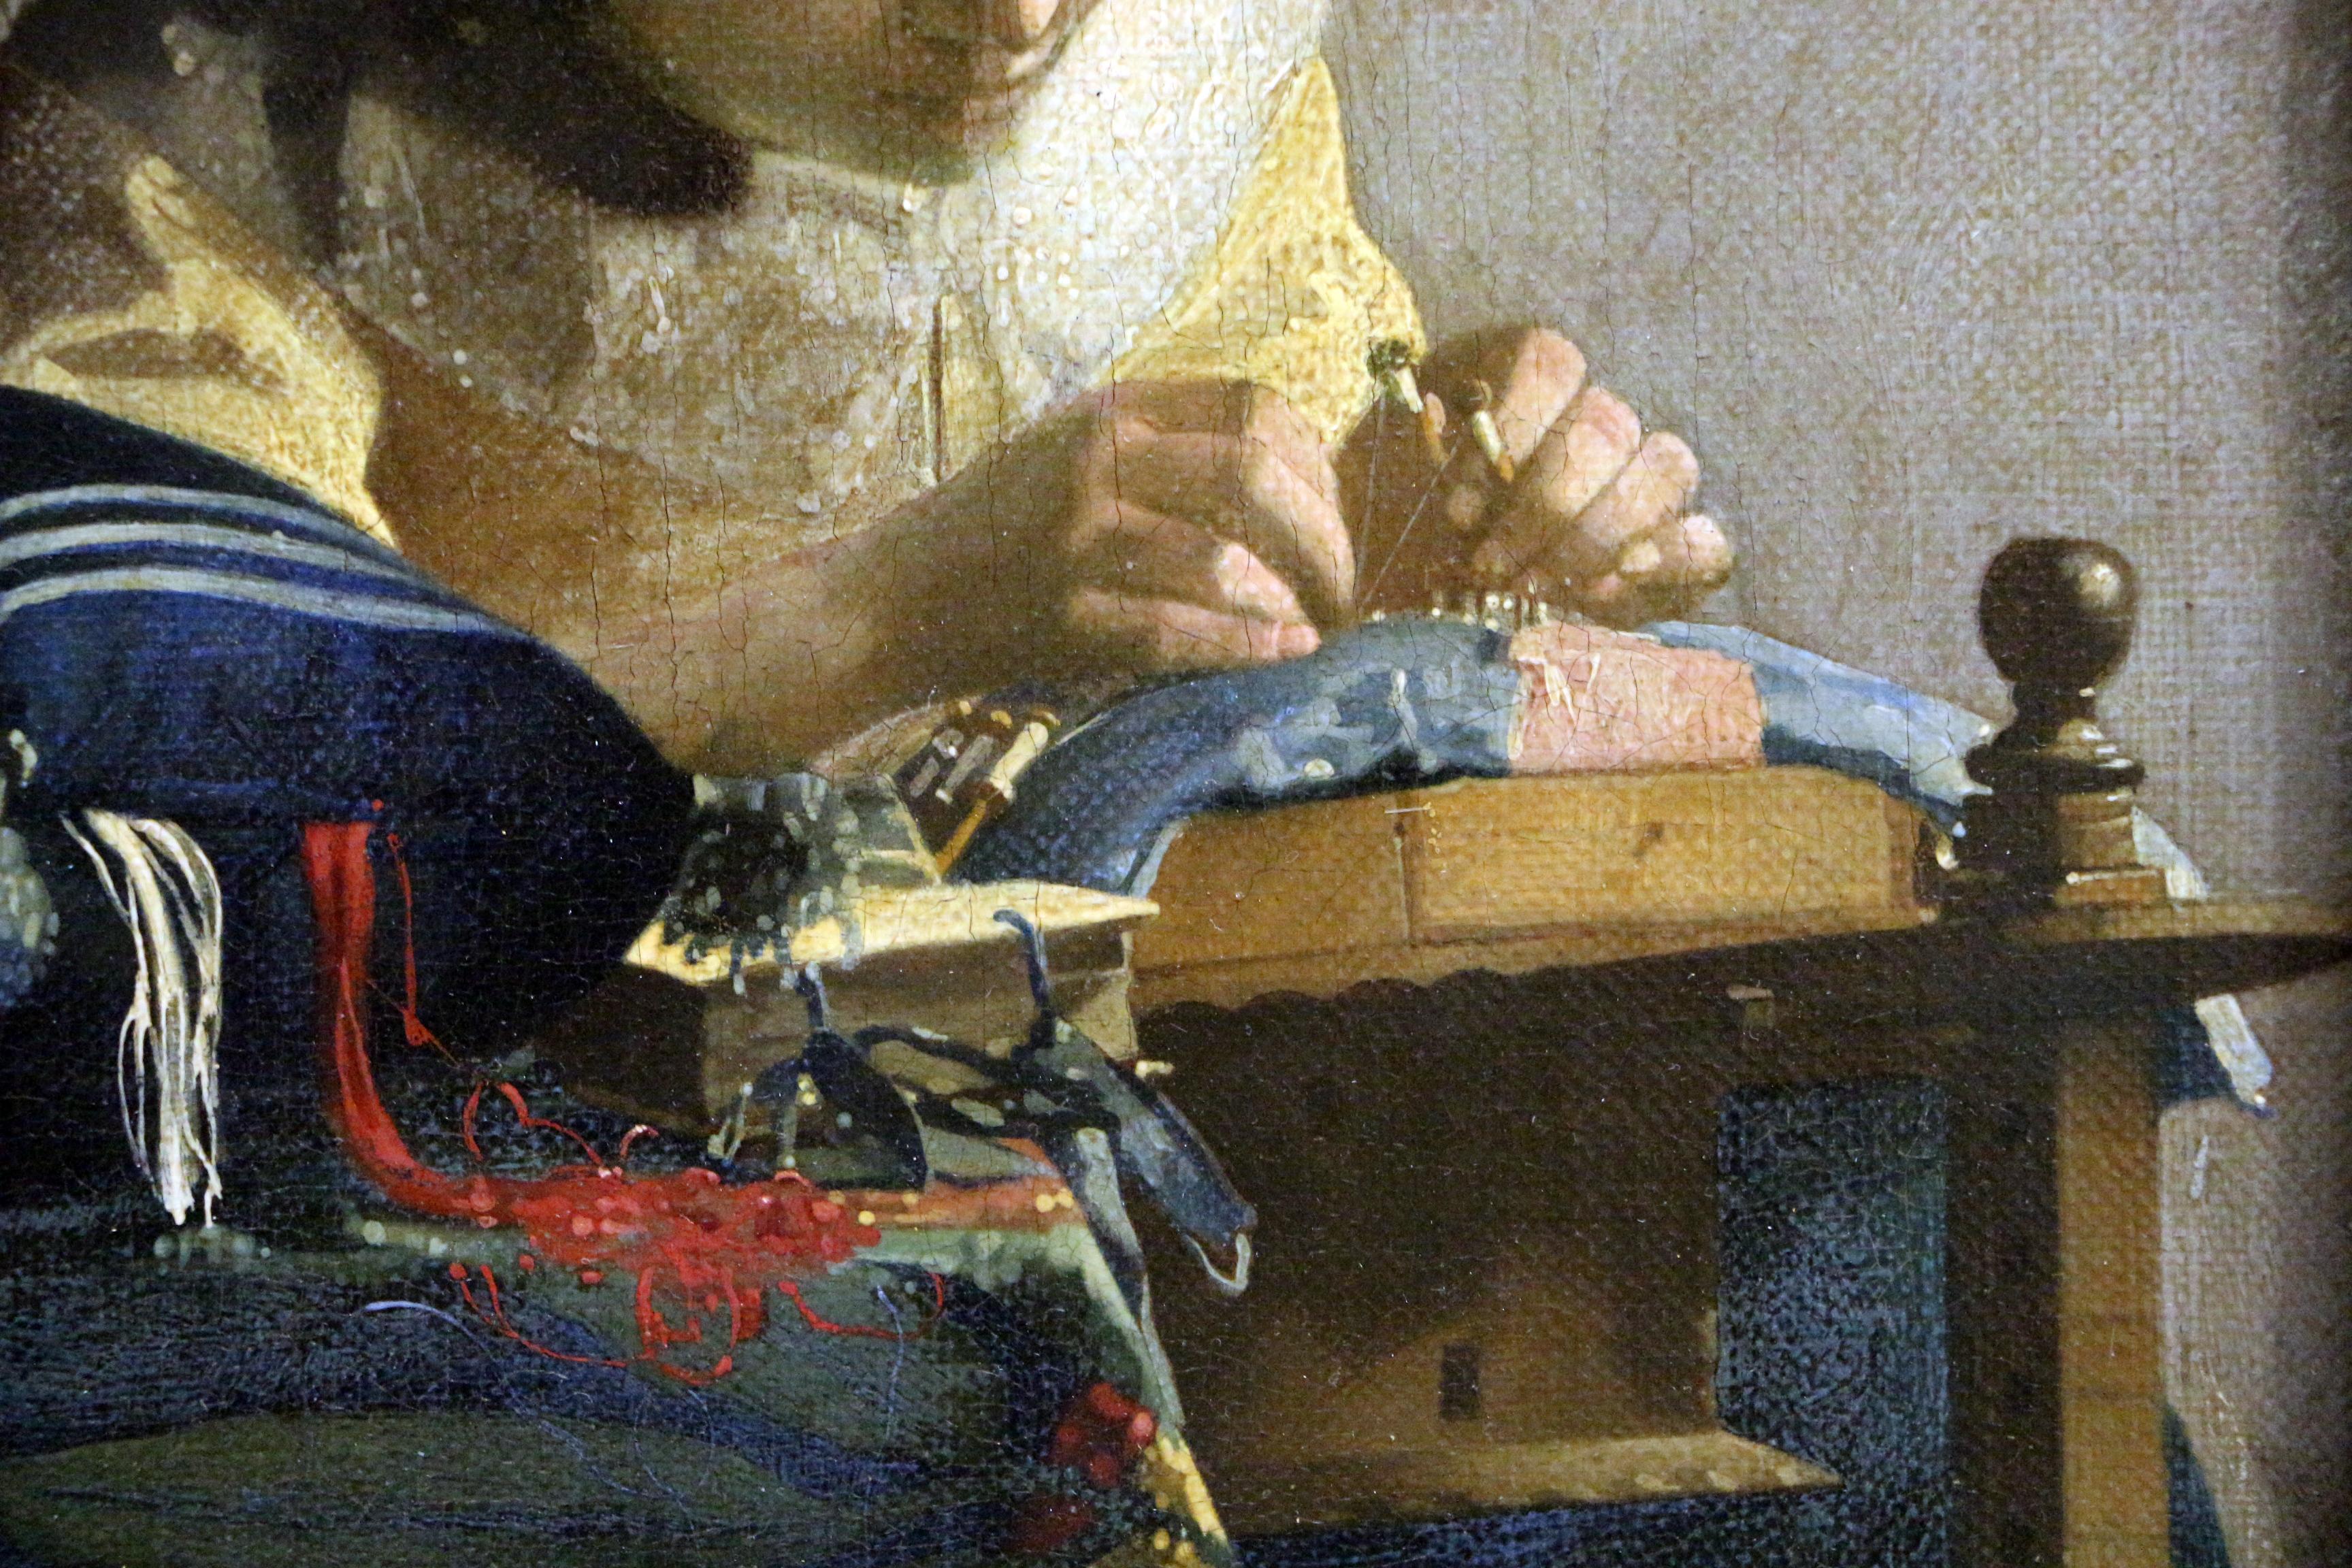 File:Johannes vermeer, la merlettaia (dentellière), 1669-70 ca.